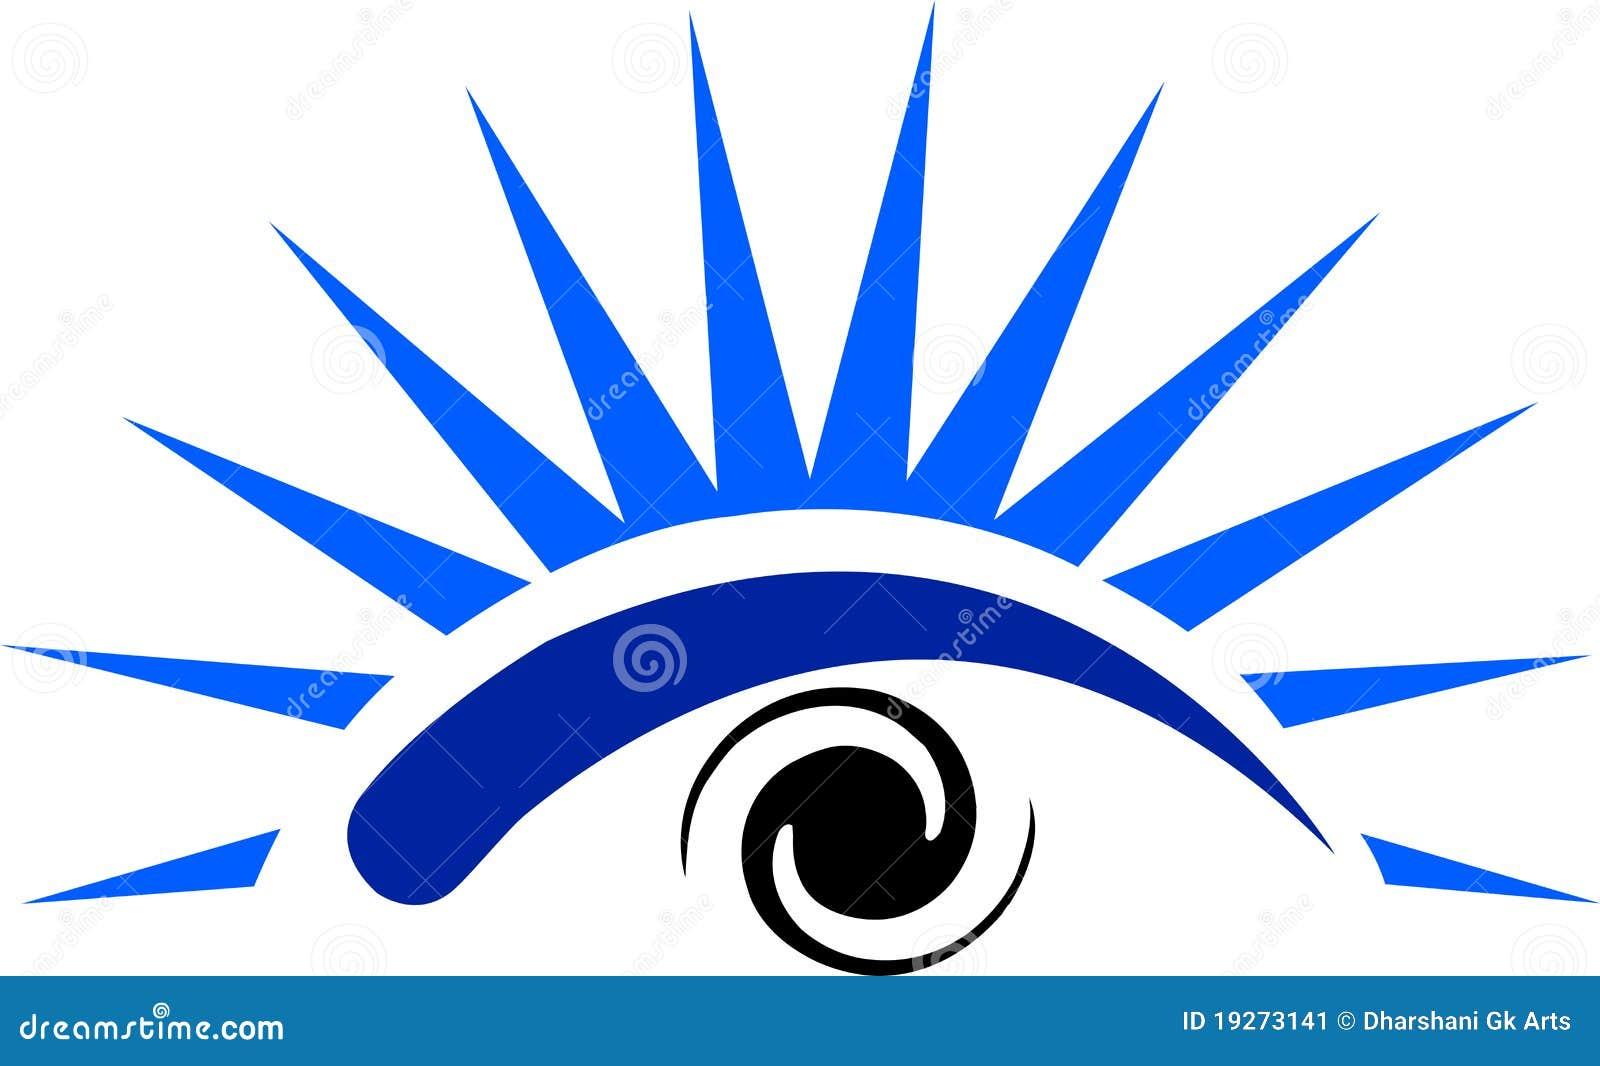 Illustration art of a eye logo with isolated background.